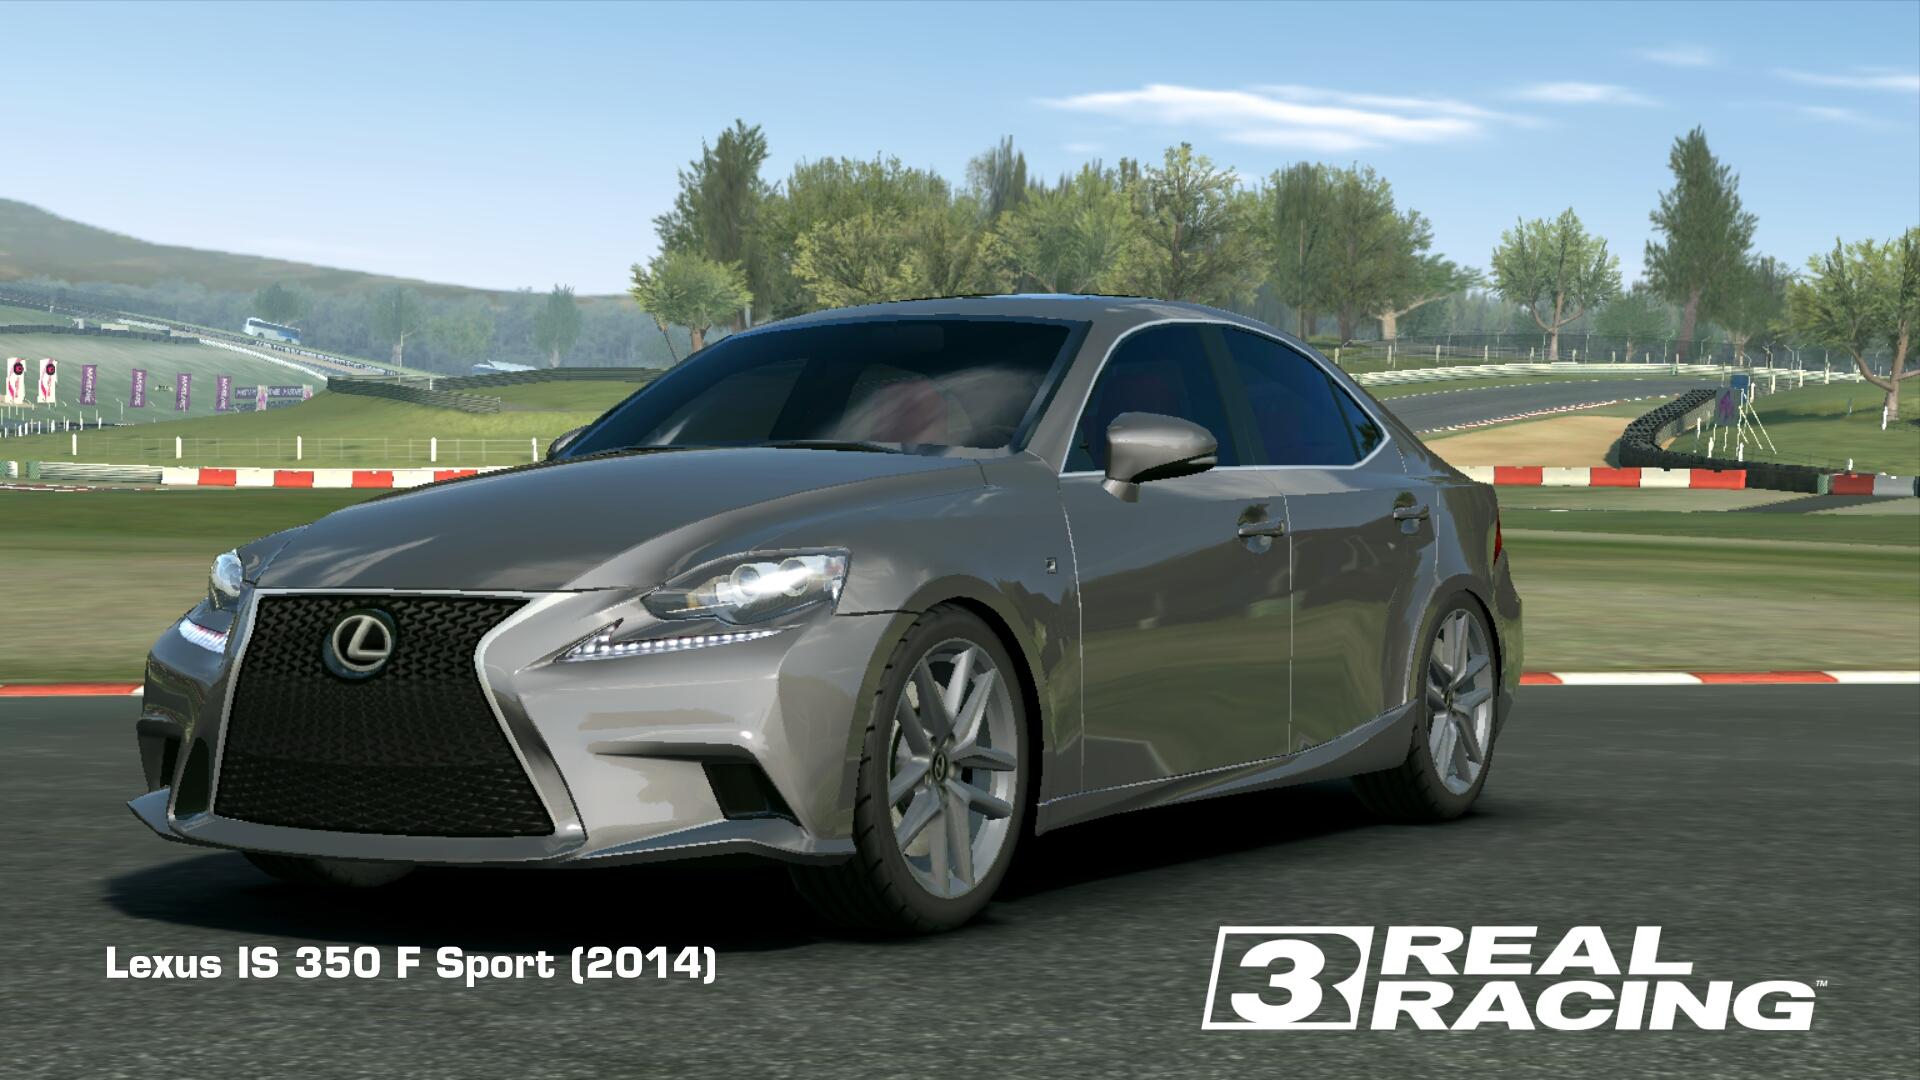 Lexus IS 350 F Sport 2014 Real Racing 3 Wiki